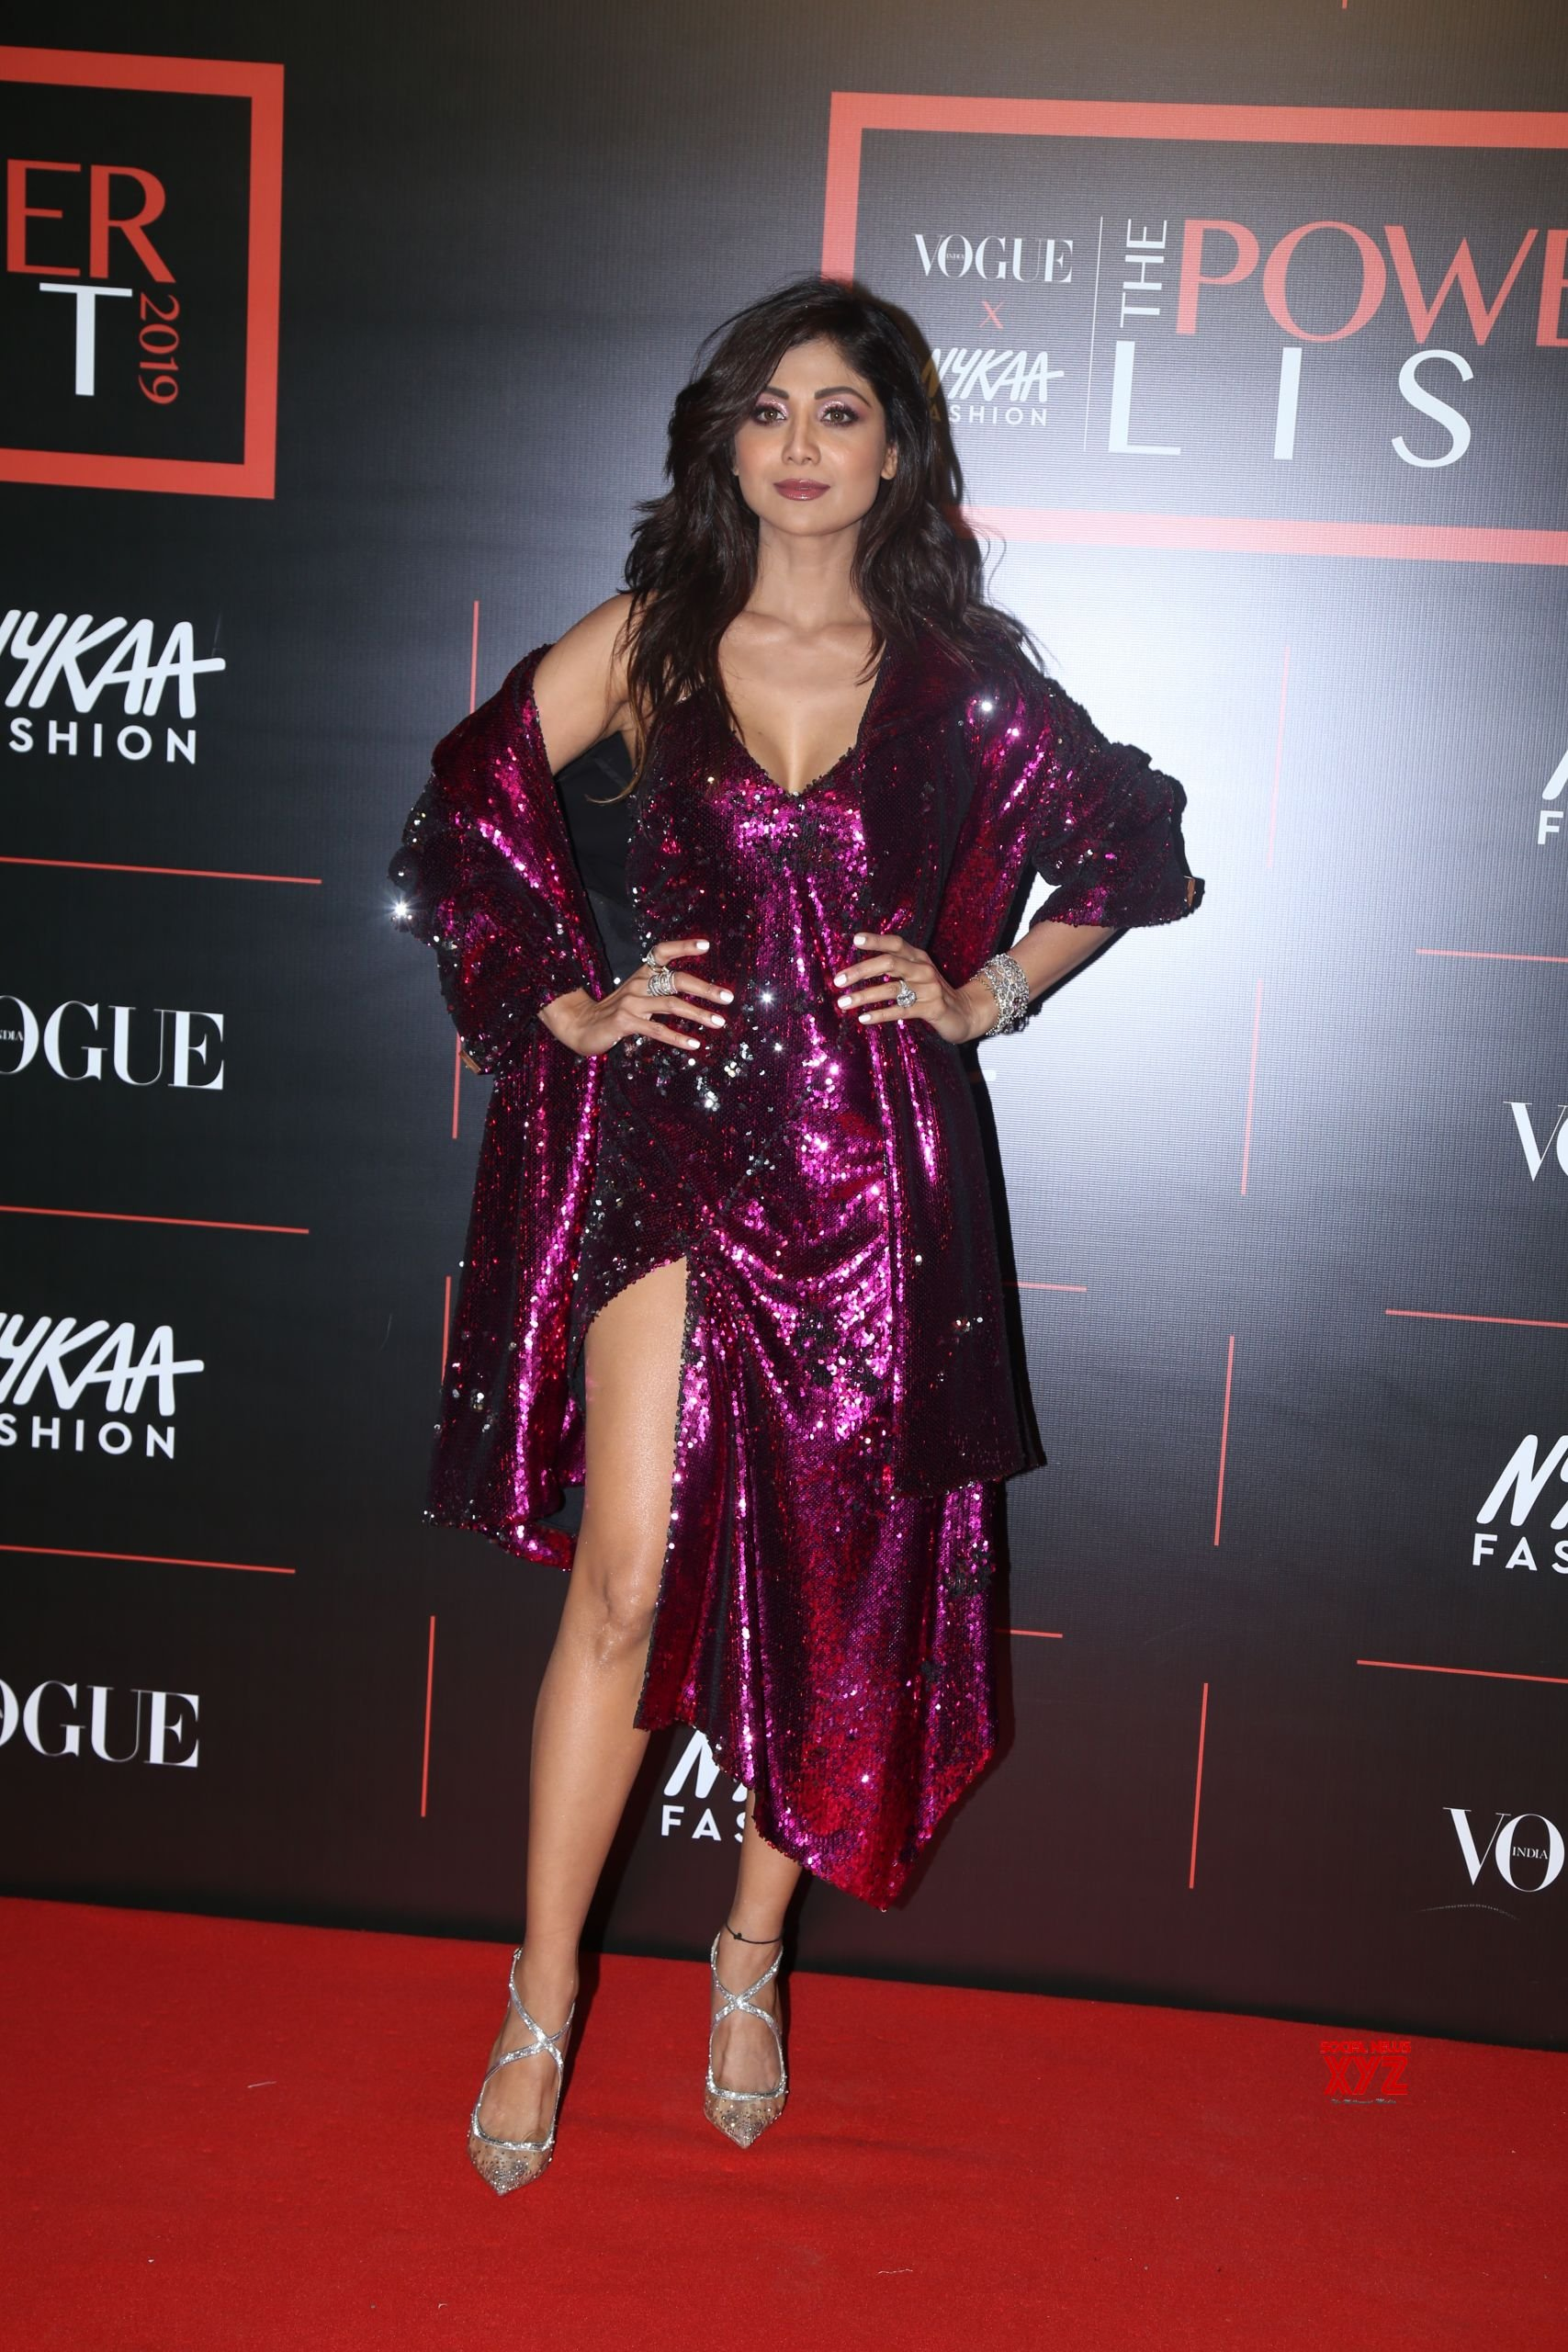 Actress Shilpa Shetty Hot Hd Stills From Vogue X Nykaa Fashion The Power List 2019 -2199